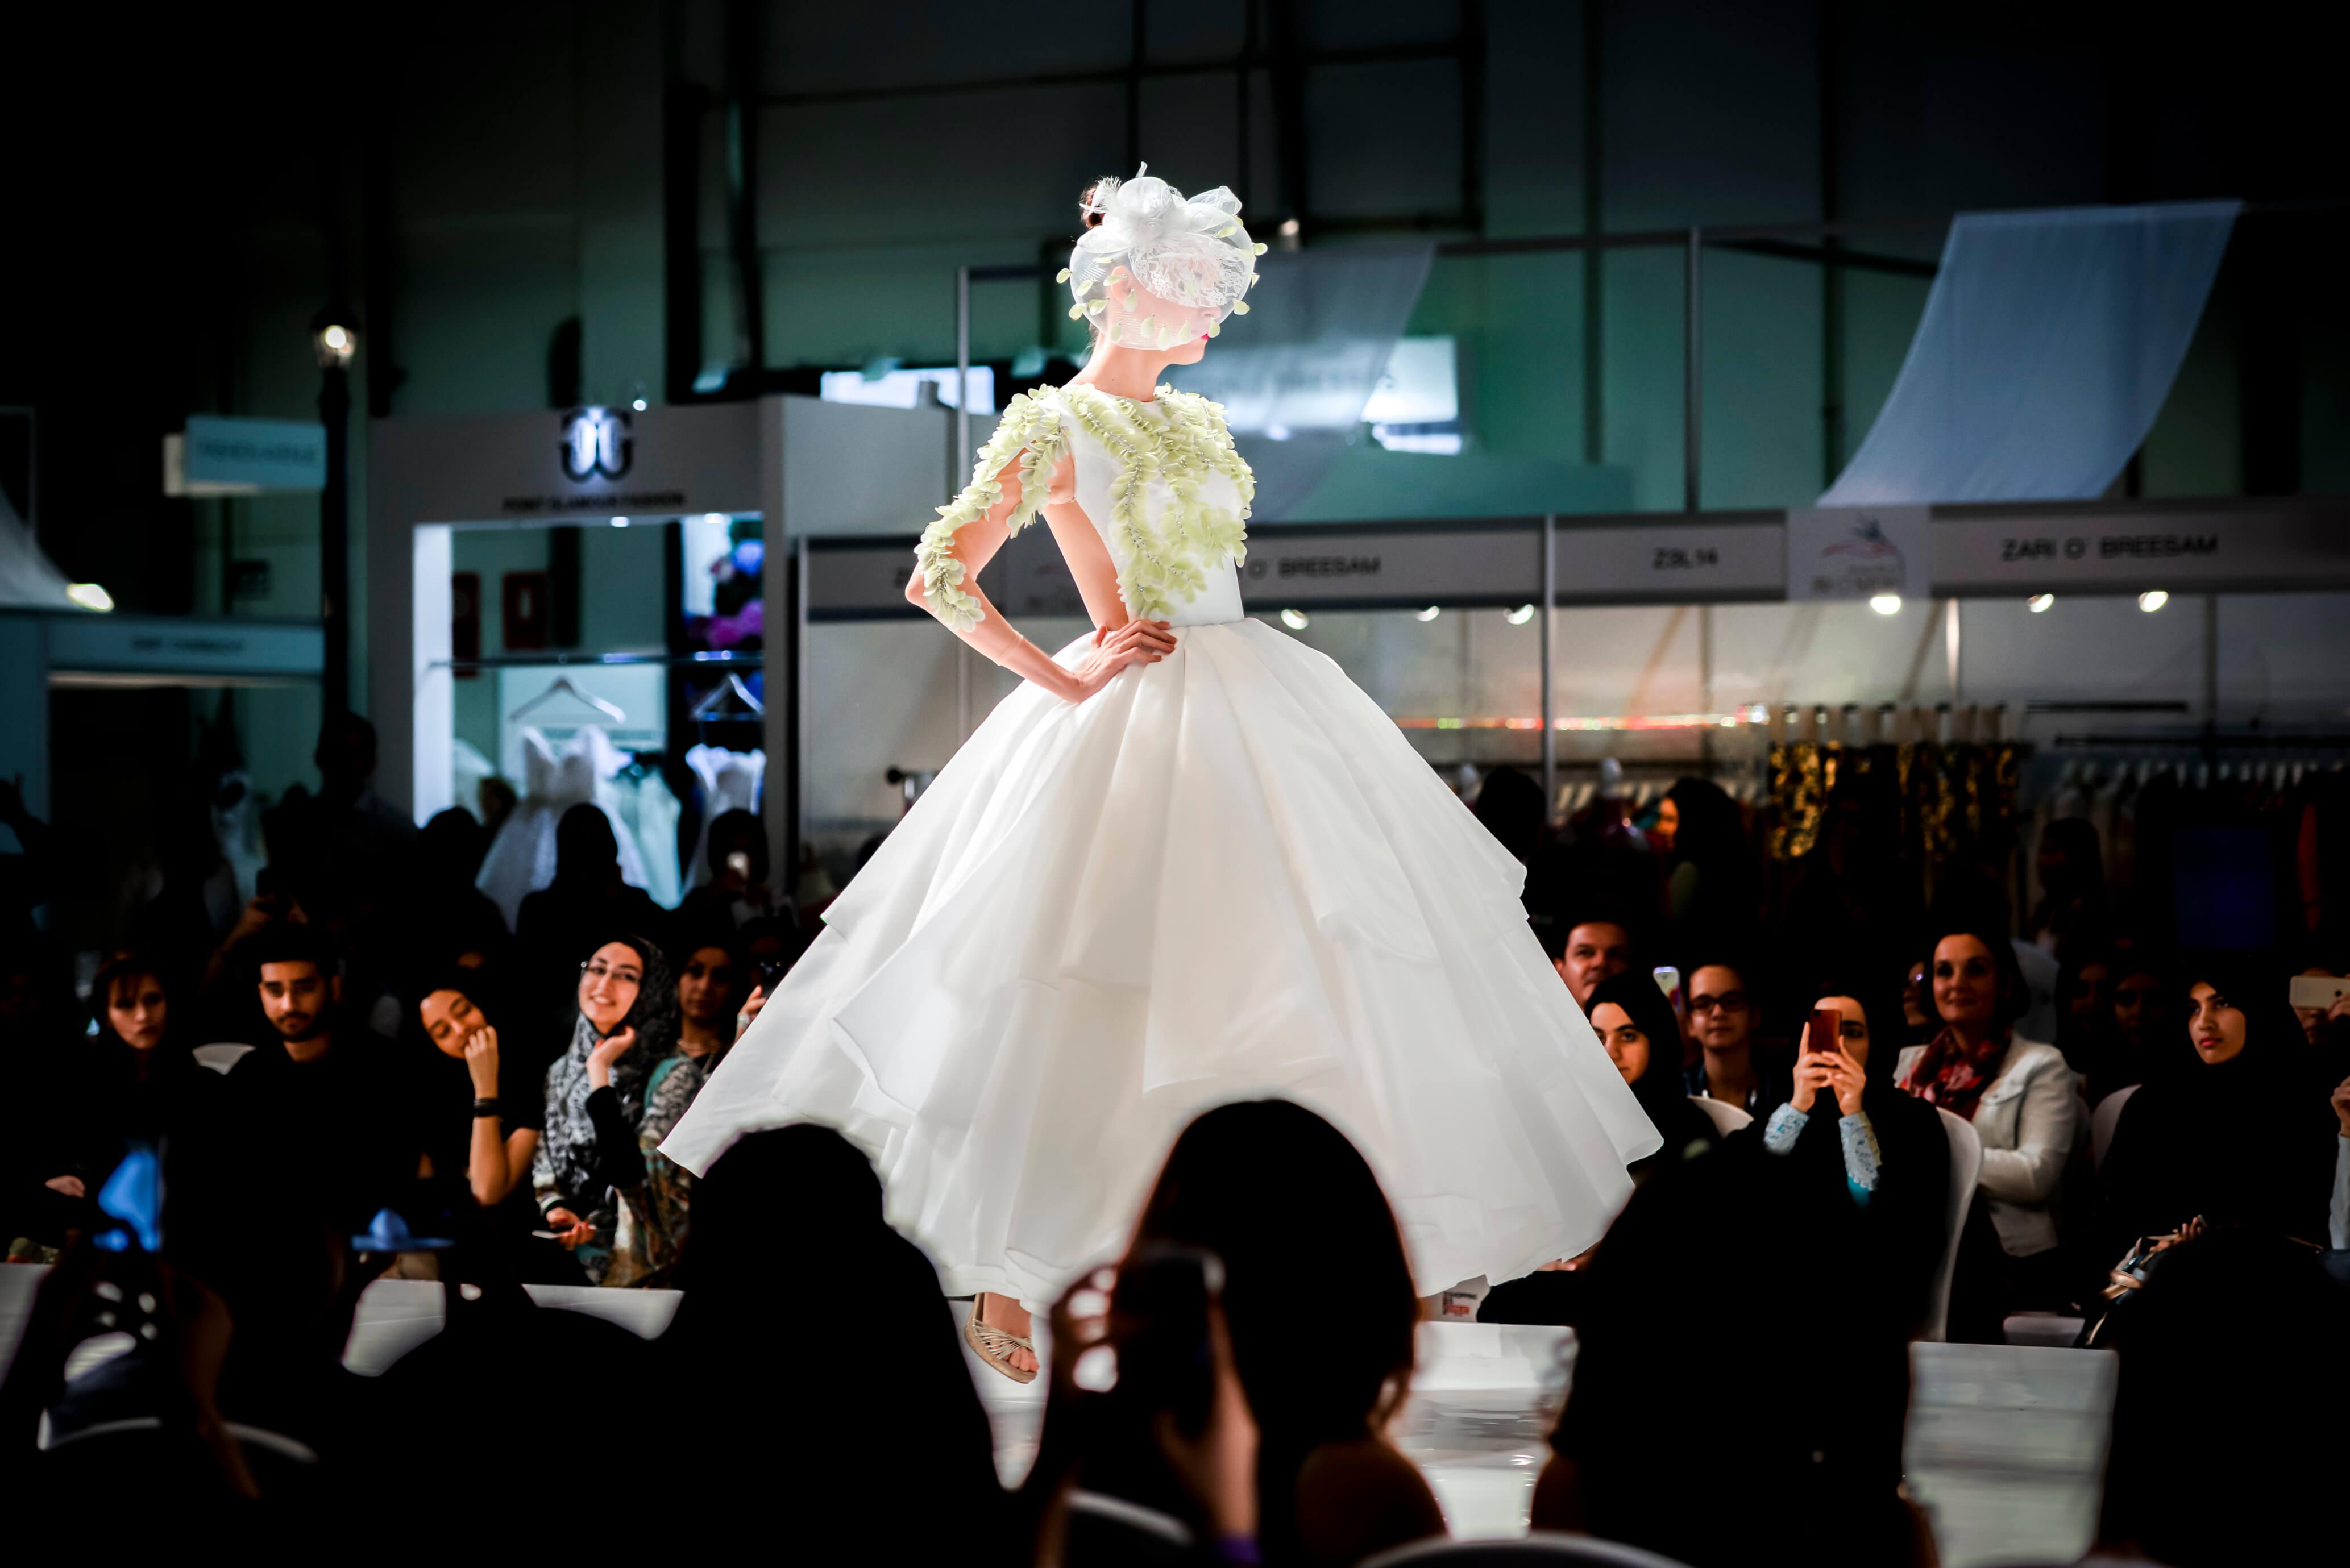 The Bride Show starts tomorrow!